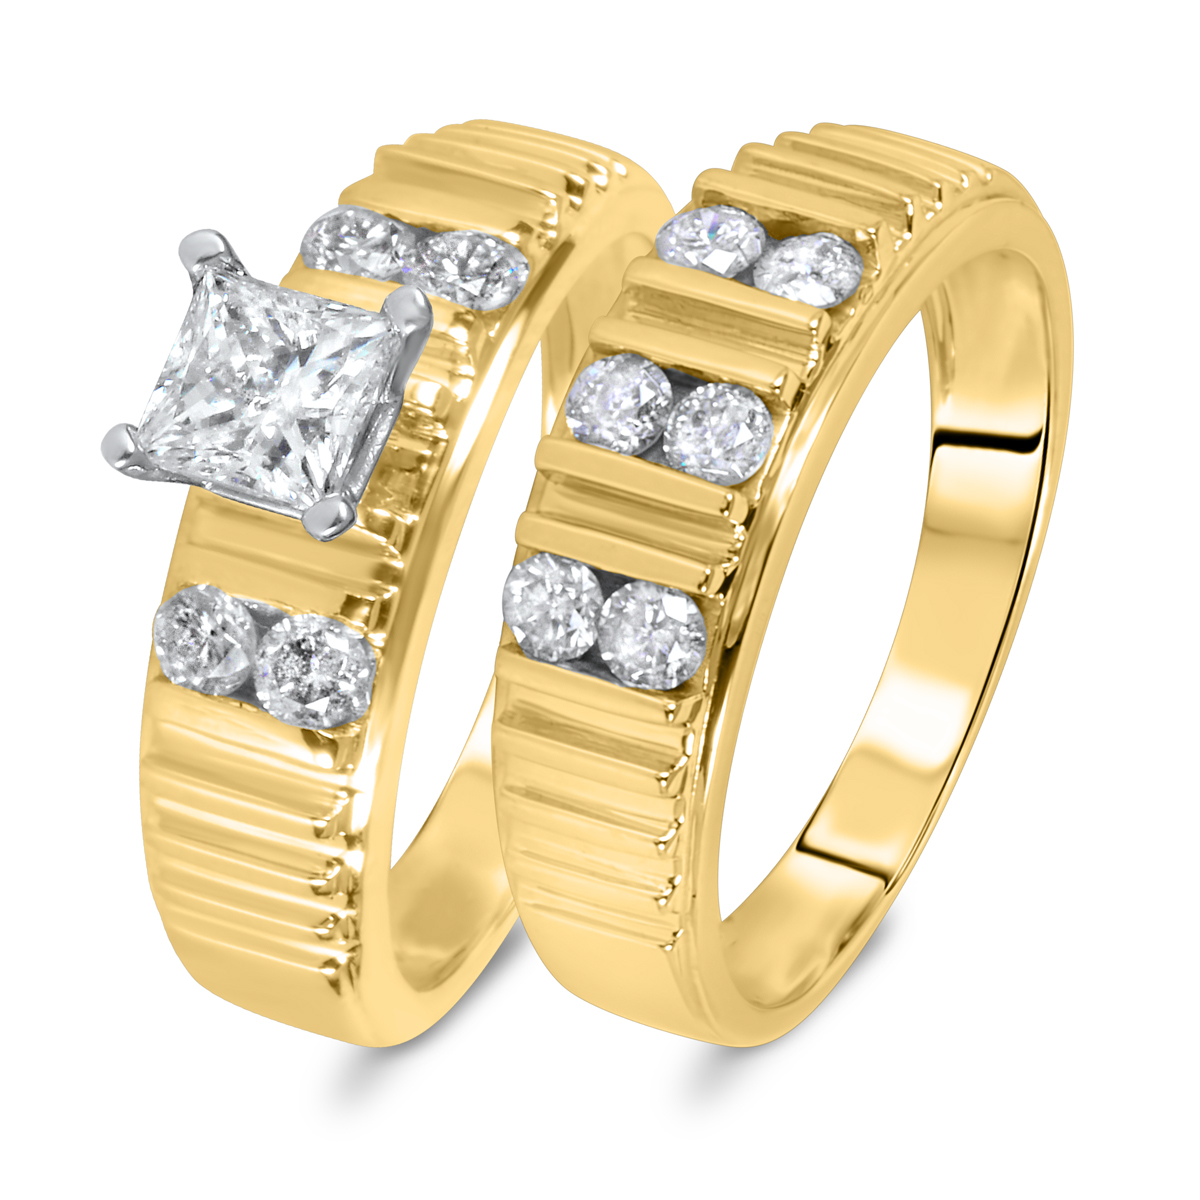 1 1/8 CT. T.W. Diamond Women's Bridal Wedding Ring Set 14K Yellow Gold